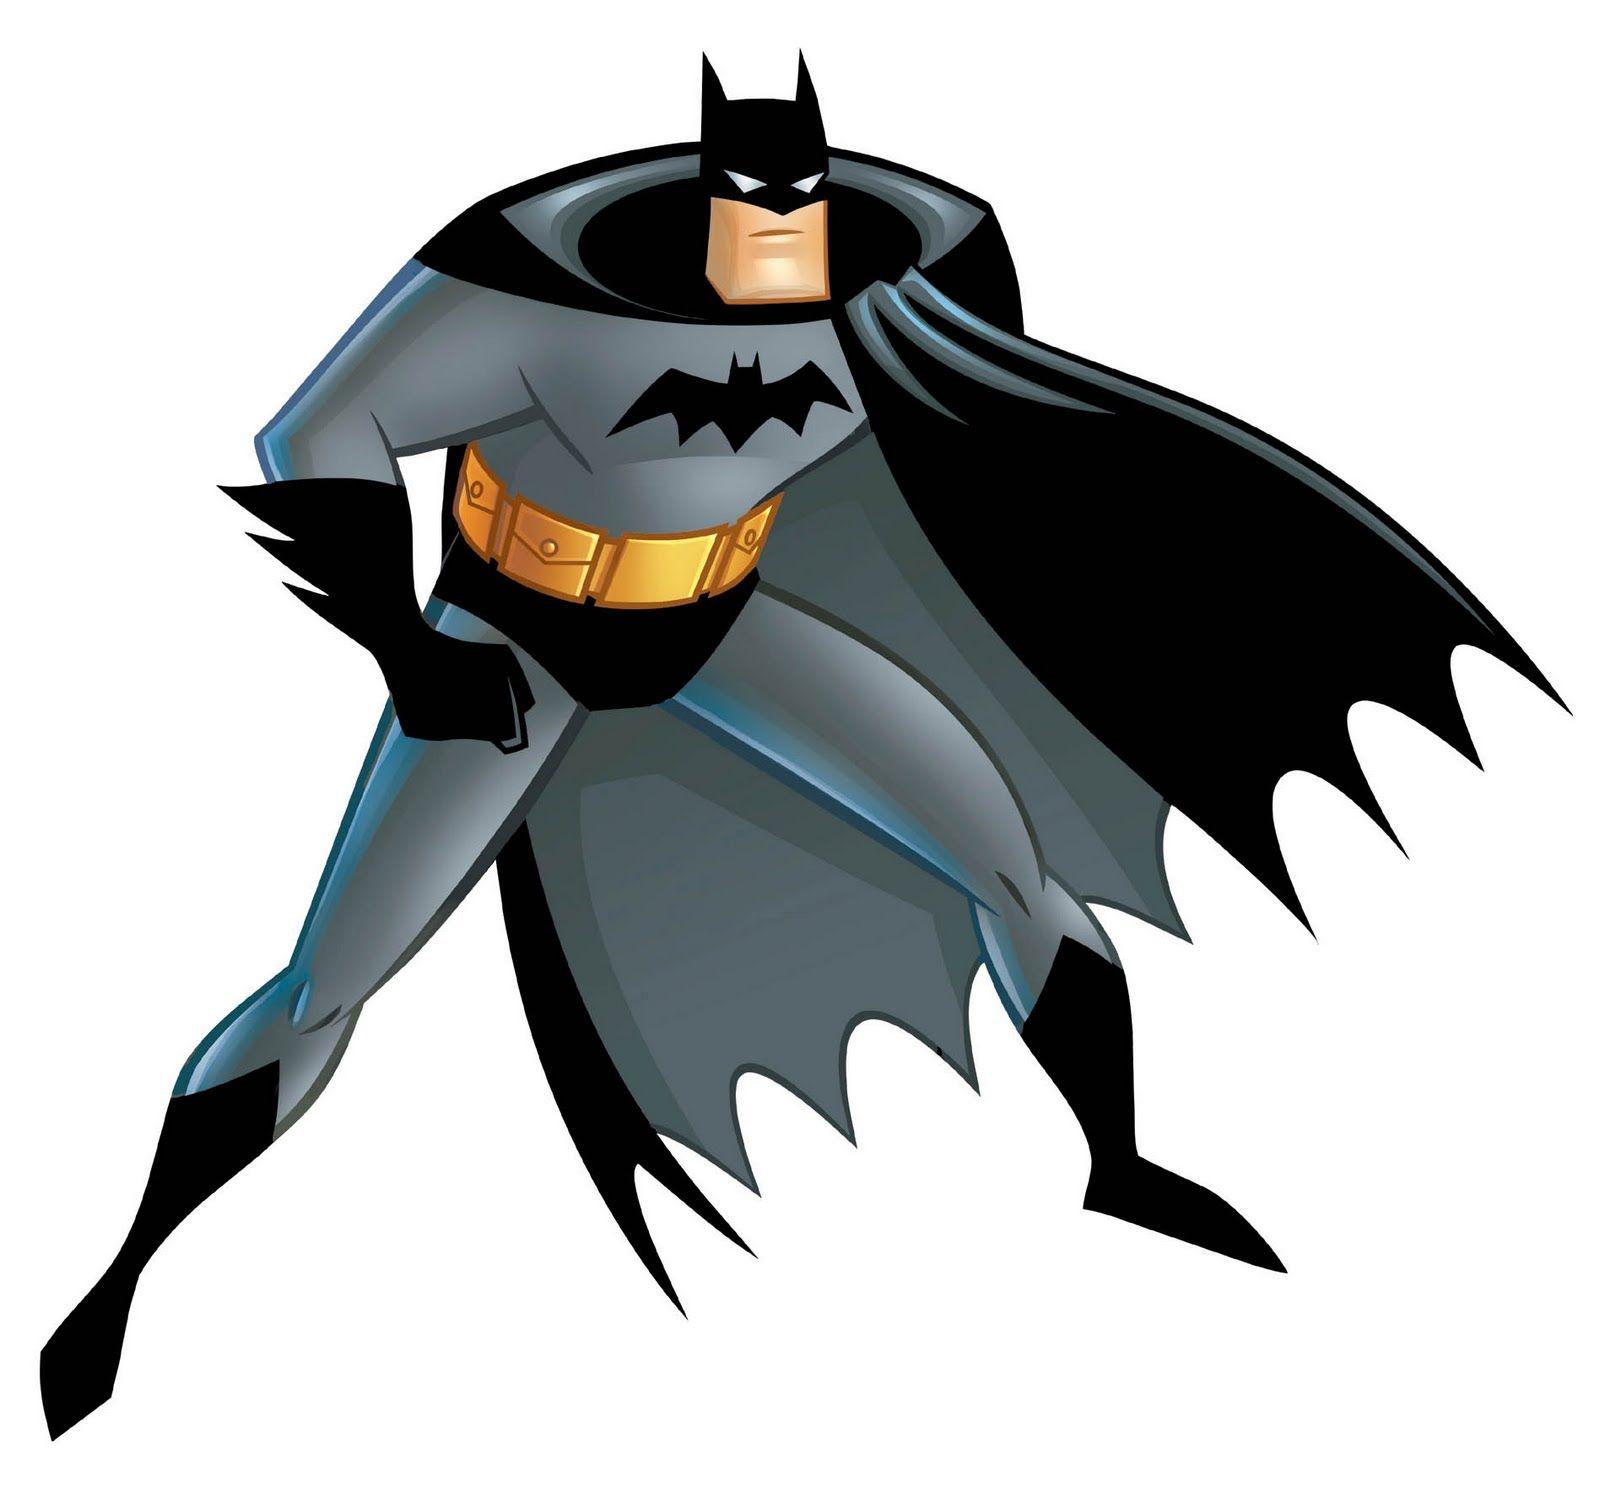 Batman Photo Birthday Invitations is nice invitation ideas